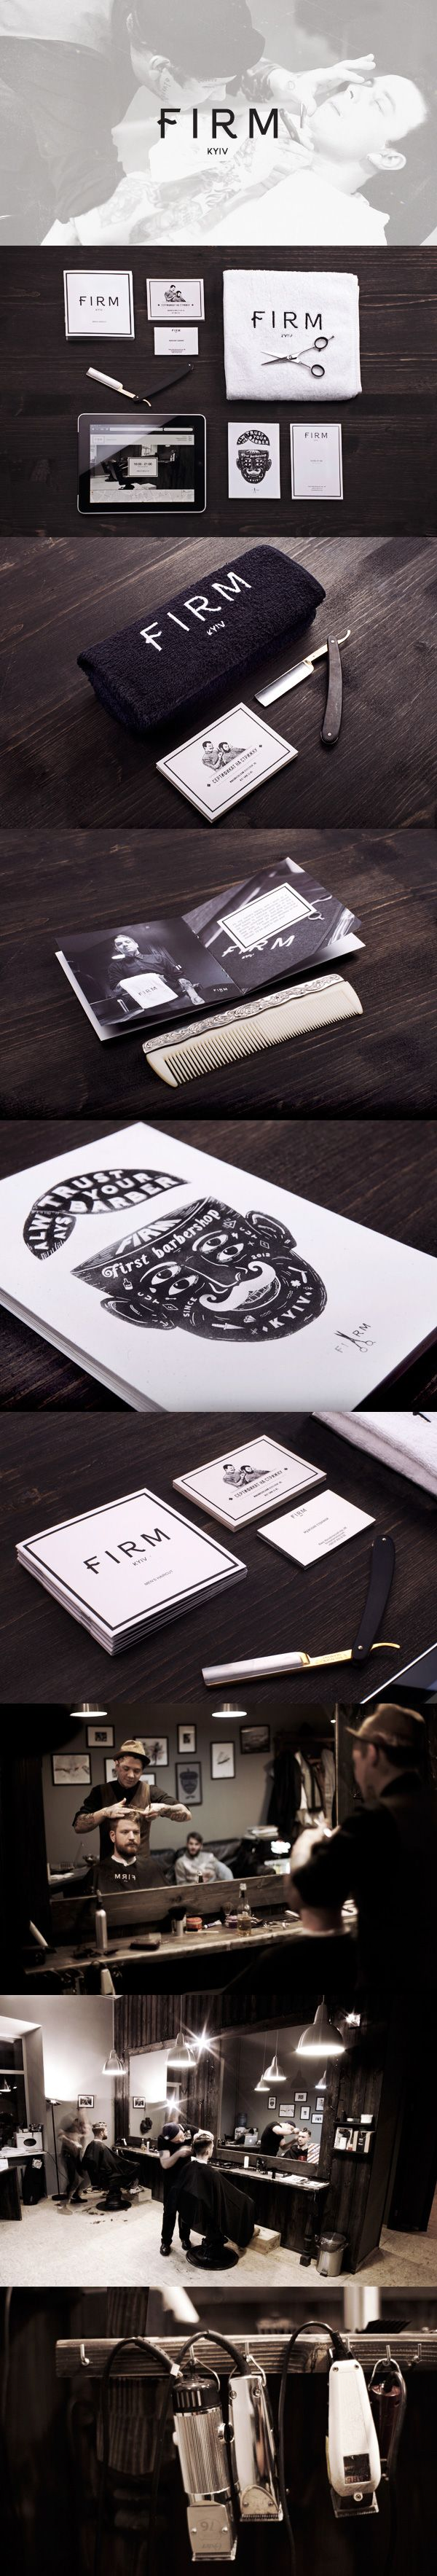 FIRM barbershop | #stationary #corporate #design #corporatedesign #identity #branding #marketing < repinned by www.BlickeDeeler.de | Take a look at www.LogoGestaltung-Hamburg.de